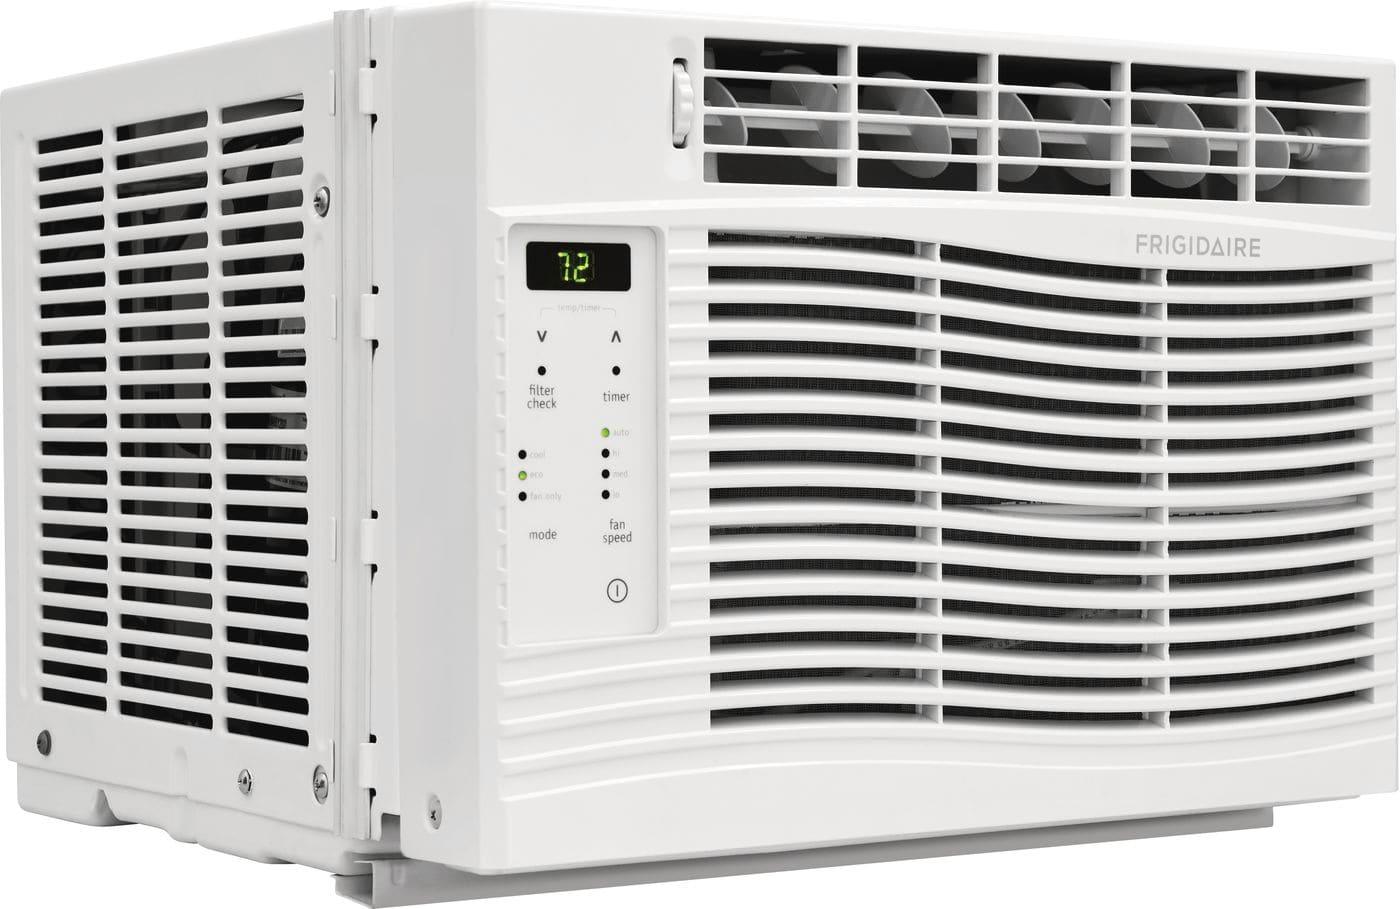 White Frigidaire FFRA0522U1 Air Conditioner